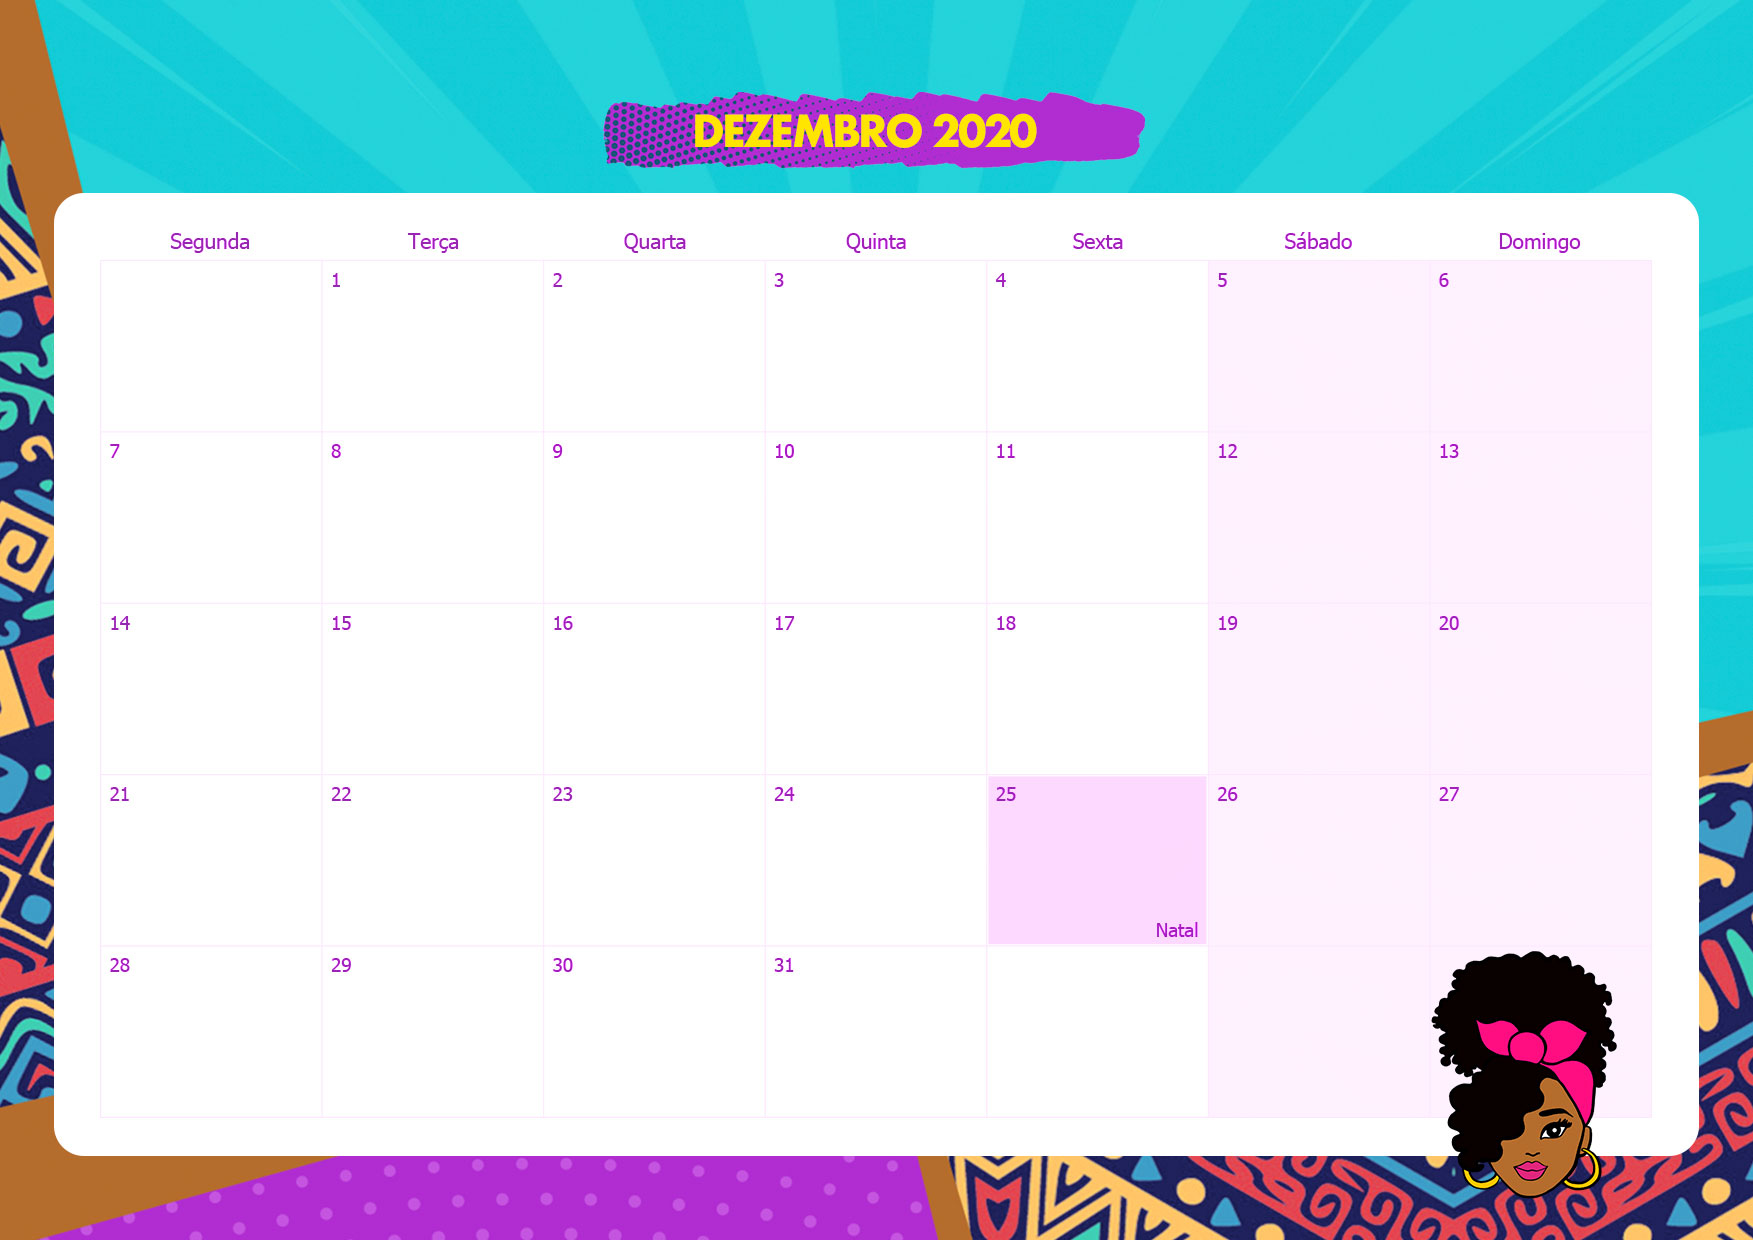 Calendario Mensal Mulher Afro Dezembro 2020